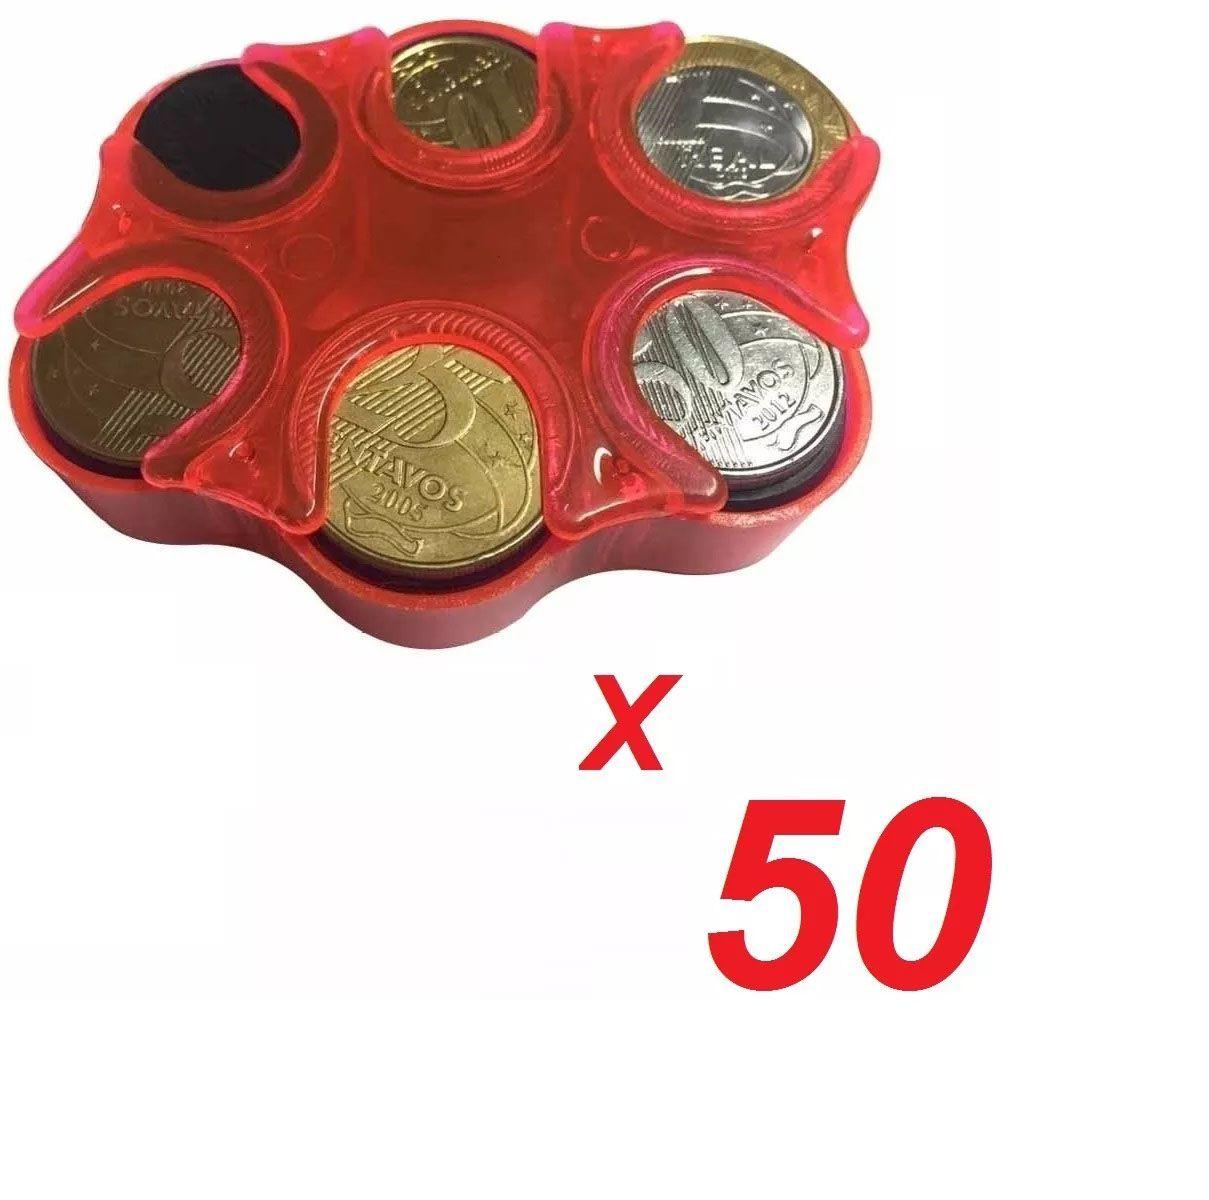 KIT 50 Porta Moedas Bolso Organizador Dinheiro Loja